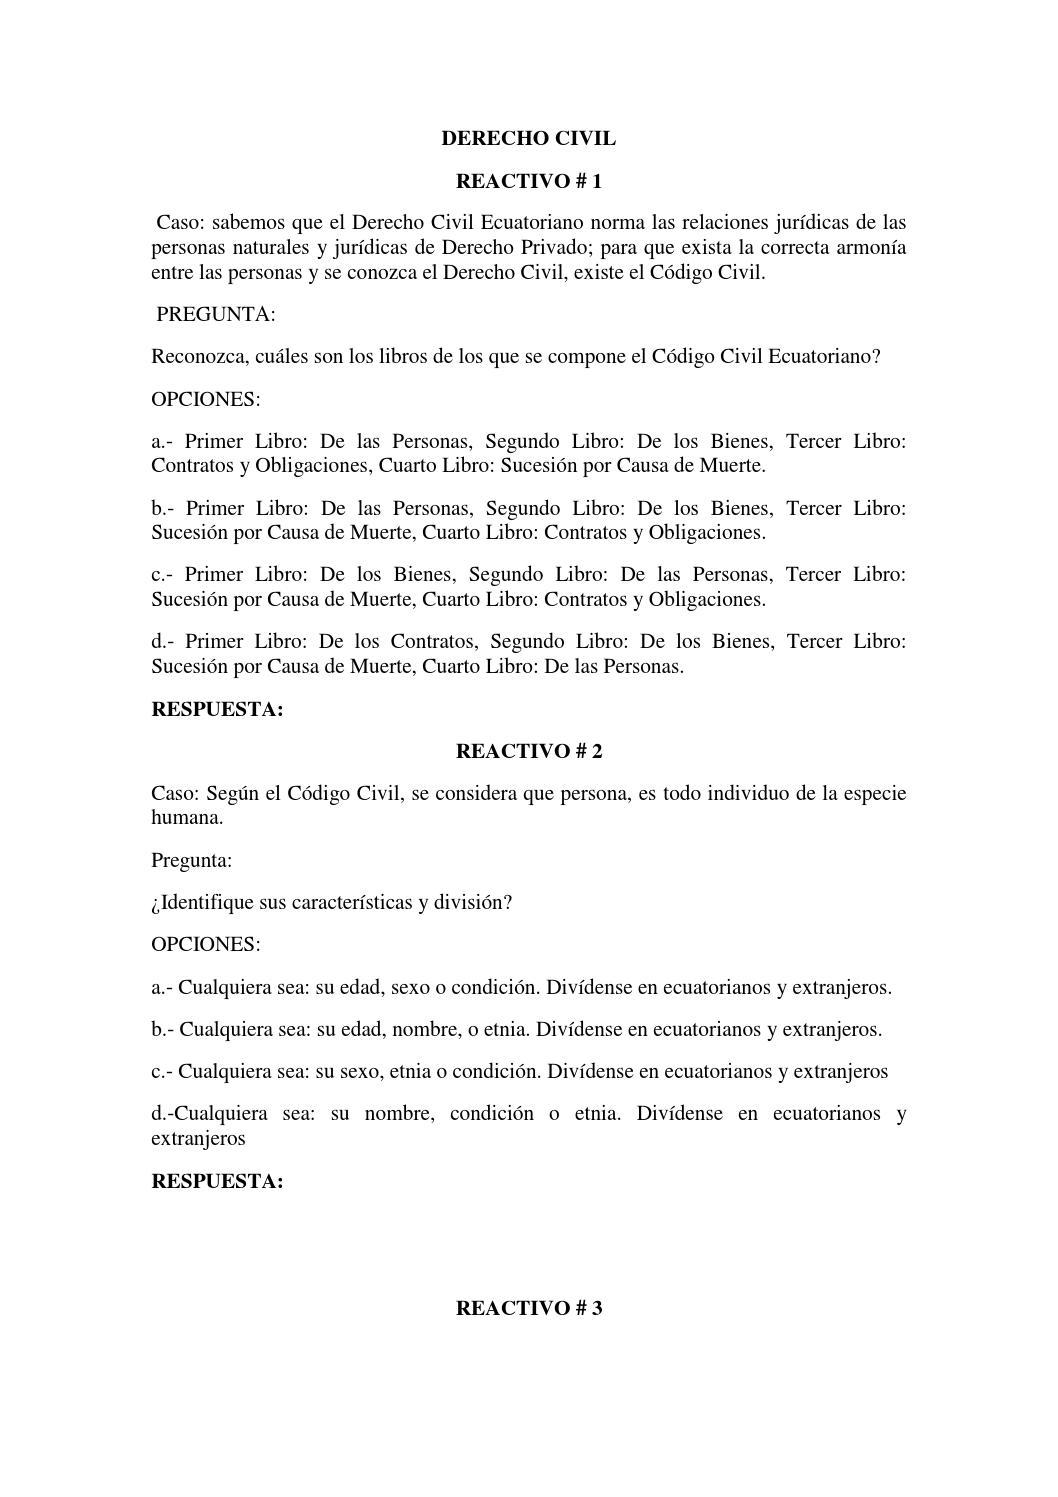 Reactivo dr ernesto vizacino by ERNESTO - issuu